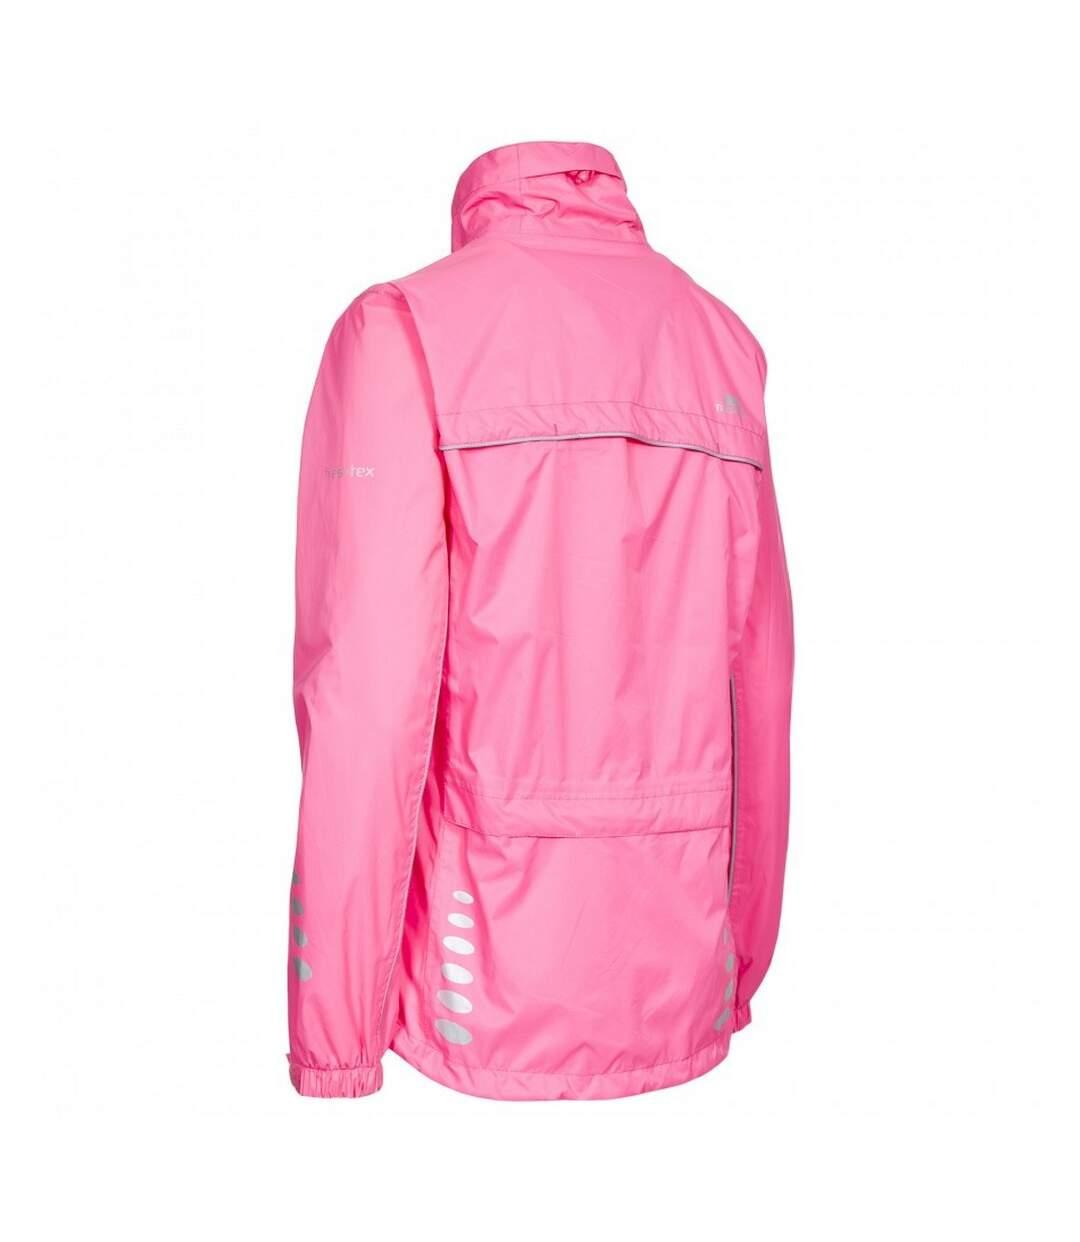 Trespass Womens/Ladies Fairing Waterproof Active Jacket (Hi-Vis Pink) - UTTP174